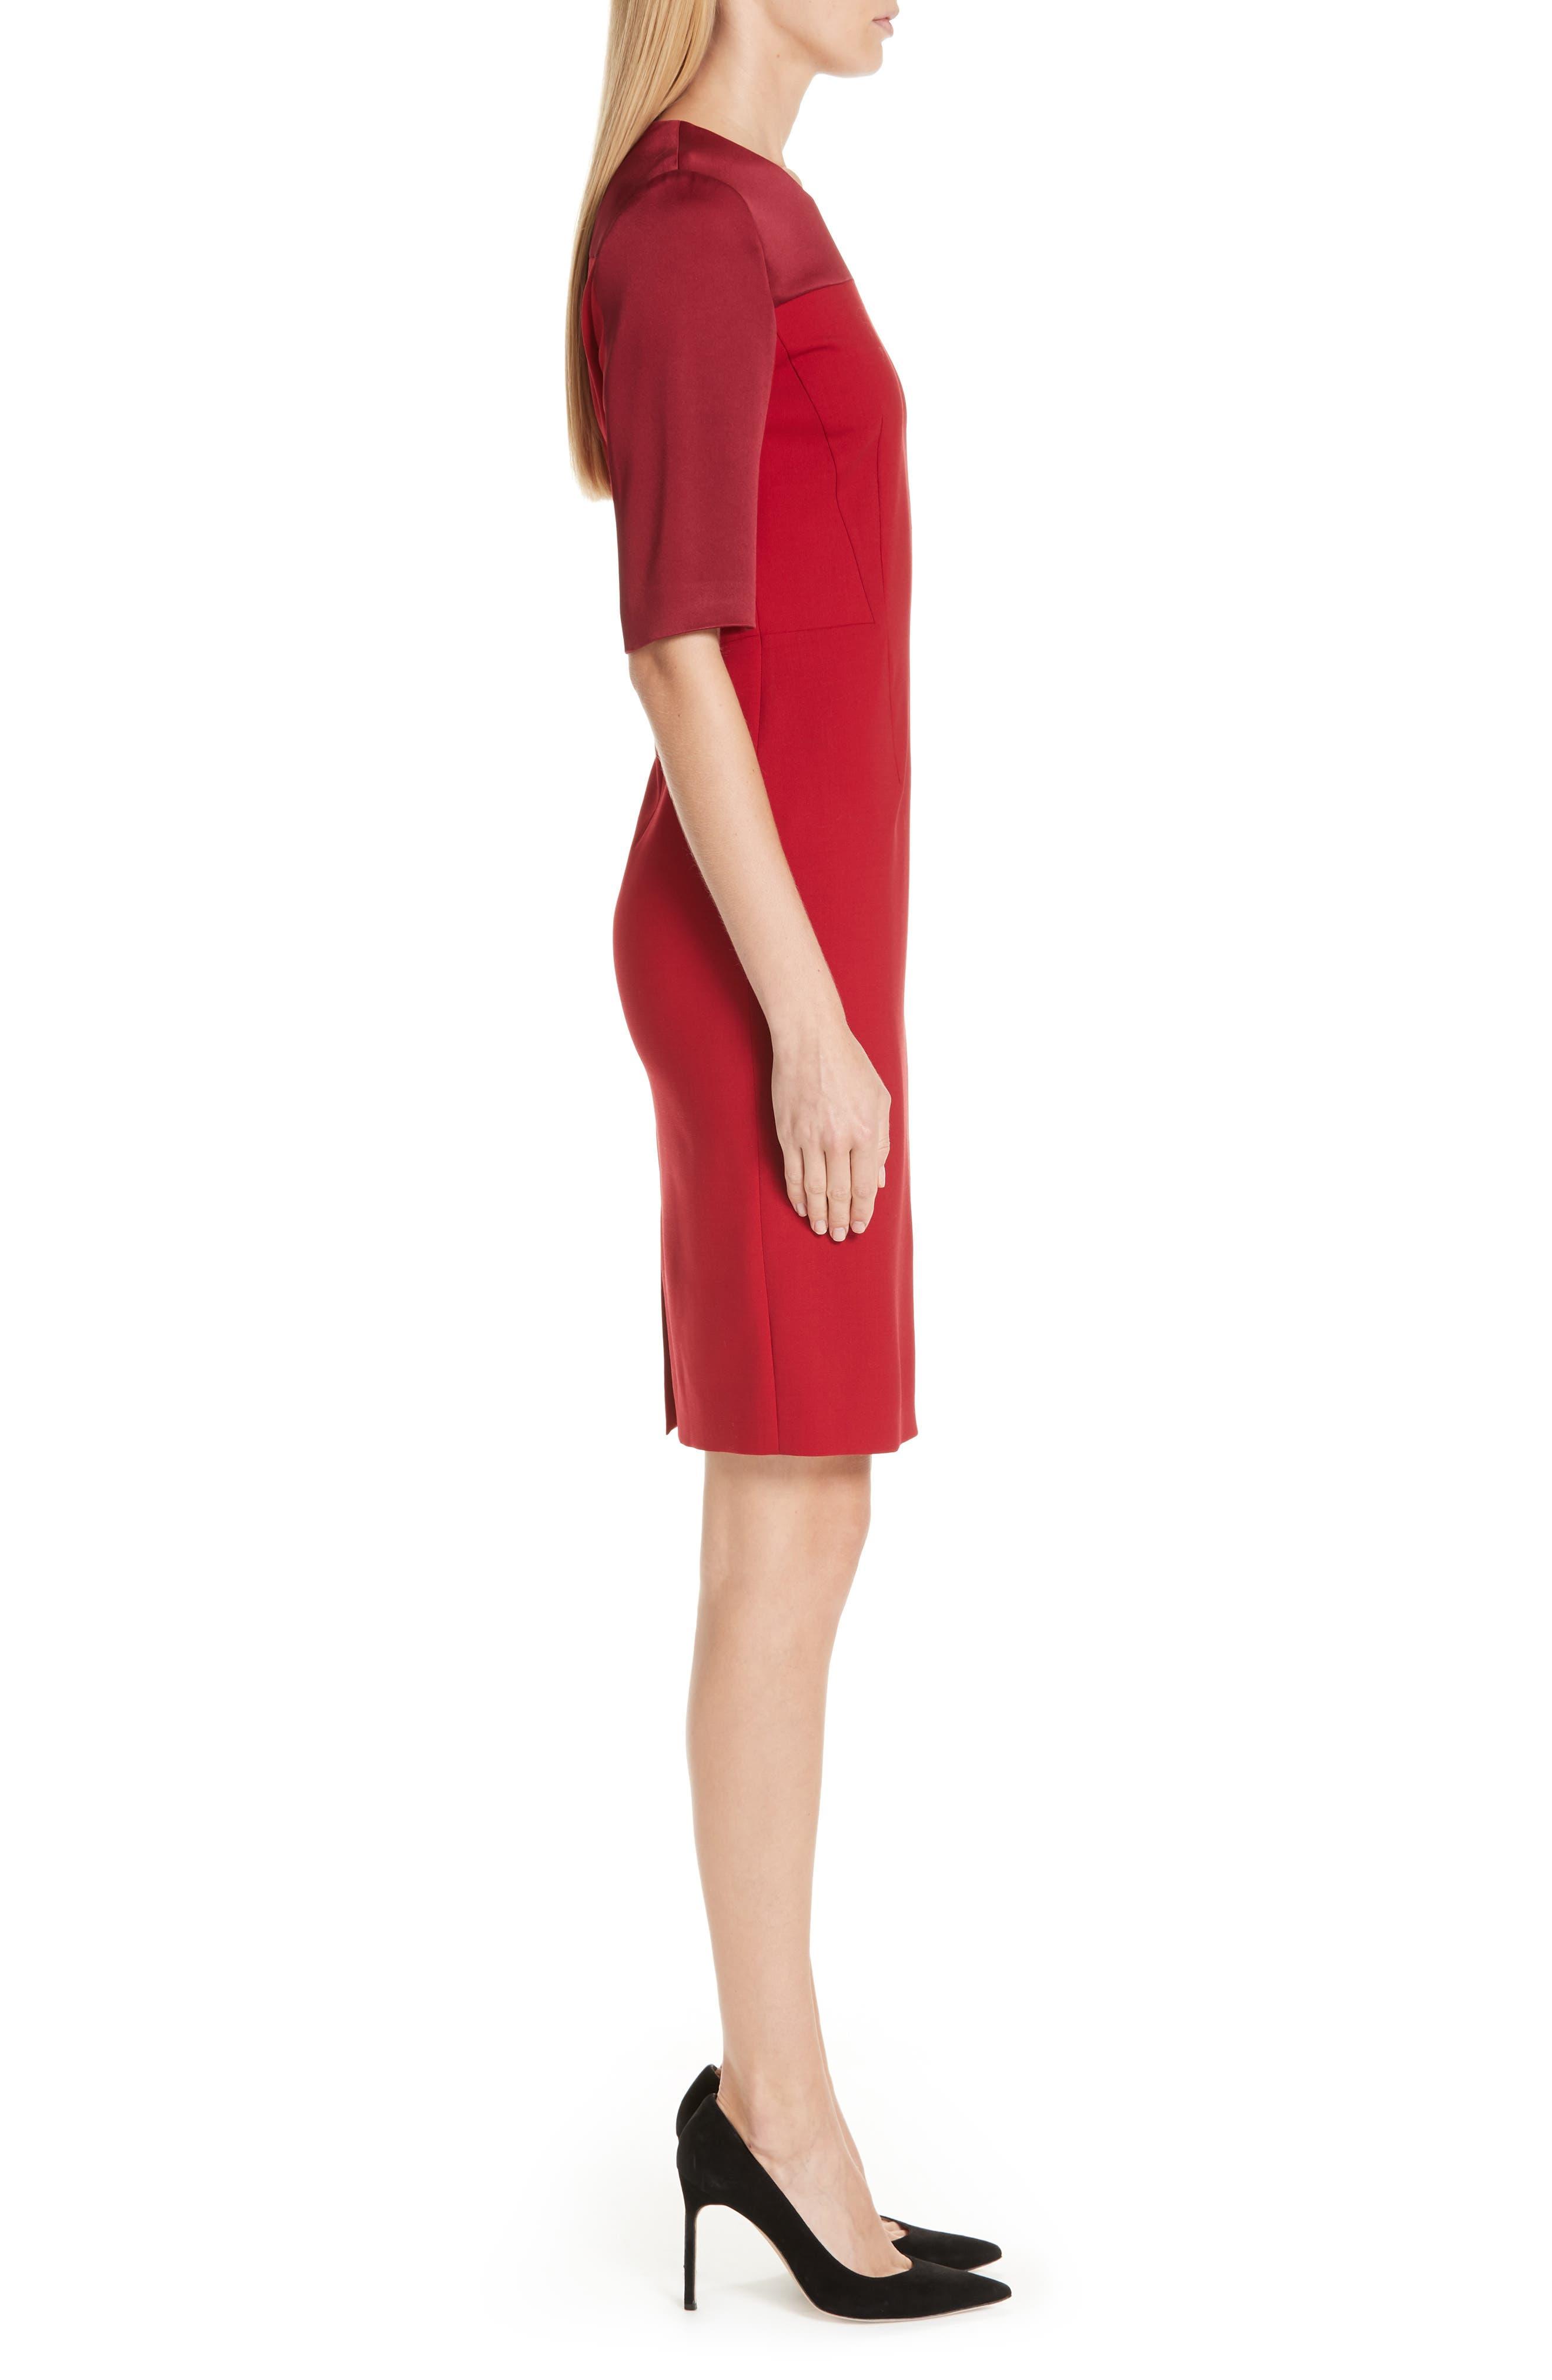 Danufa Stretch Wool Sheath Dress,                             Alternate thumbnail 3, color,                             DARK RED